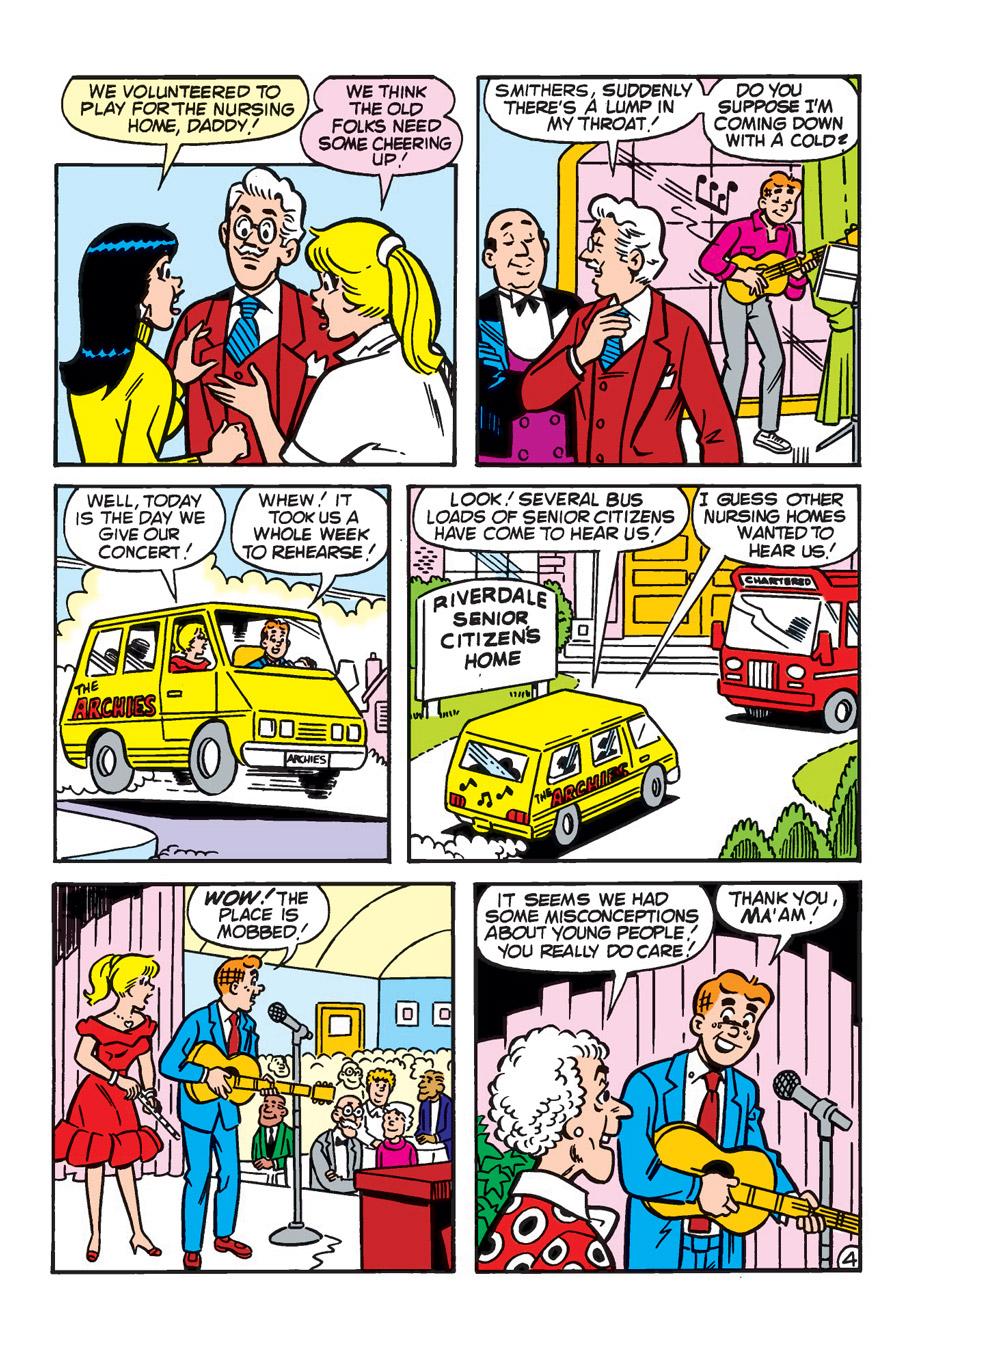 ArchieGiantComicsThrill-53 ComicList Previews: ARCHIE GIANT COMICS THRILL TP